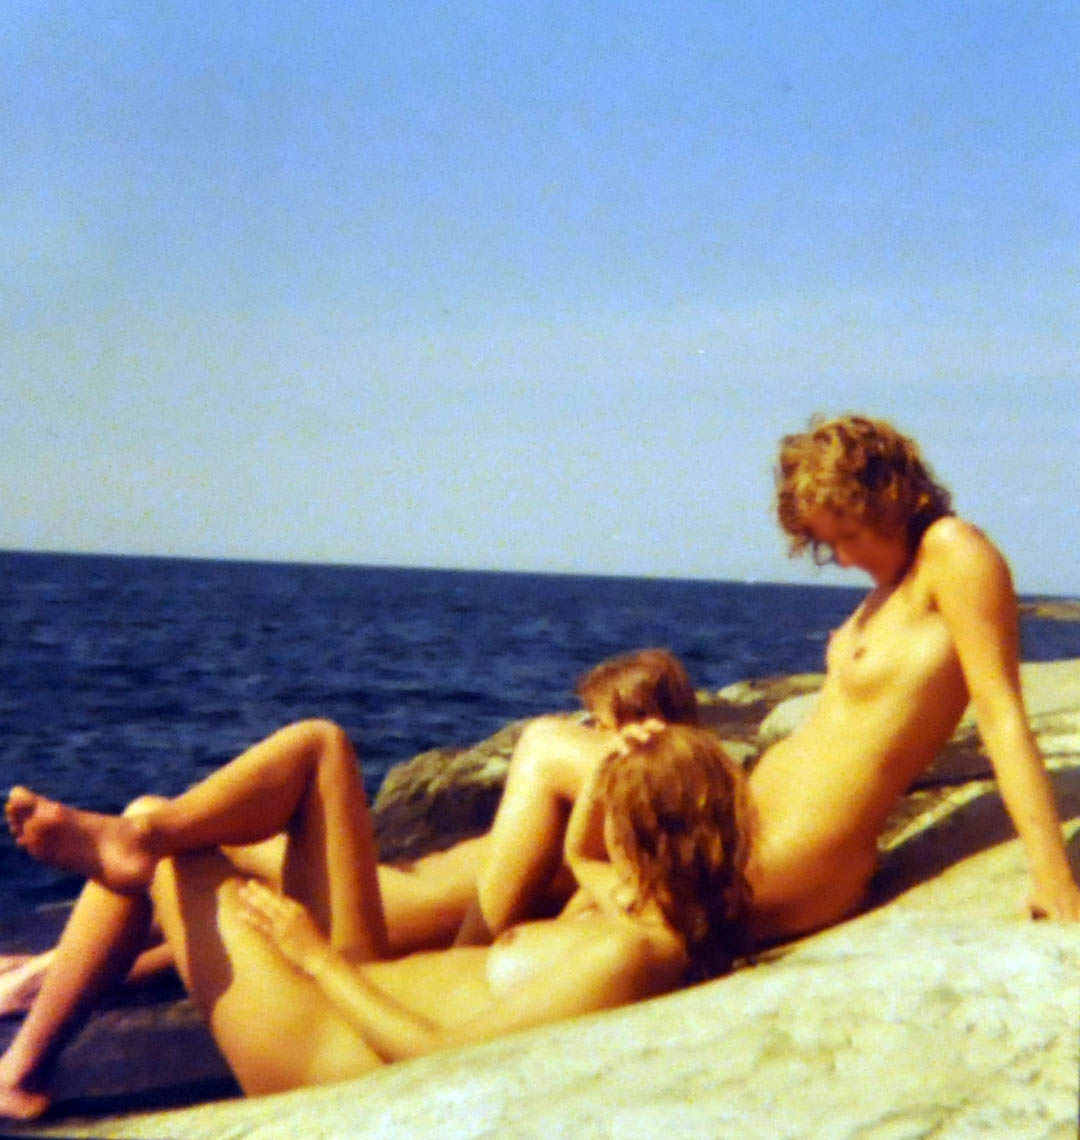 nakenbad maspalomas nakna tjejer sex